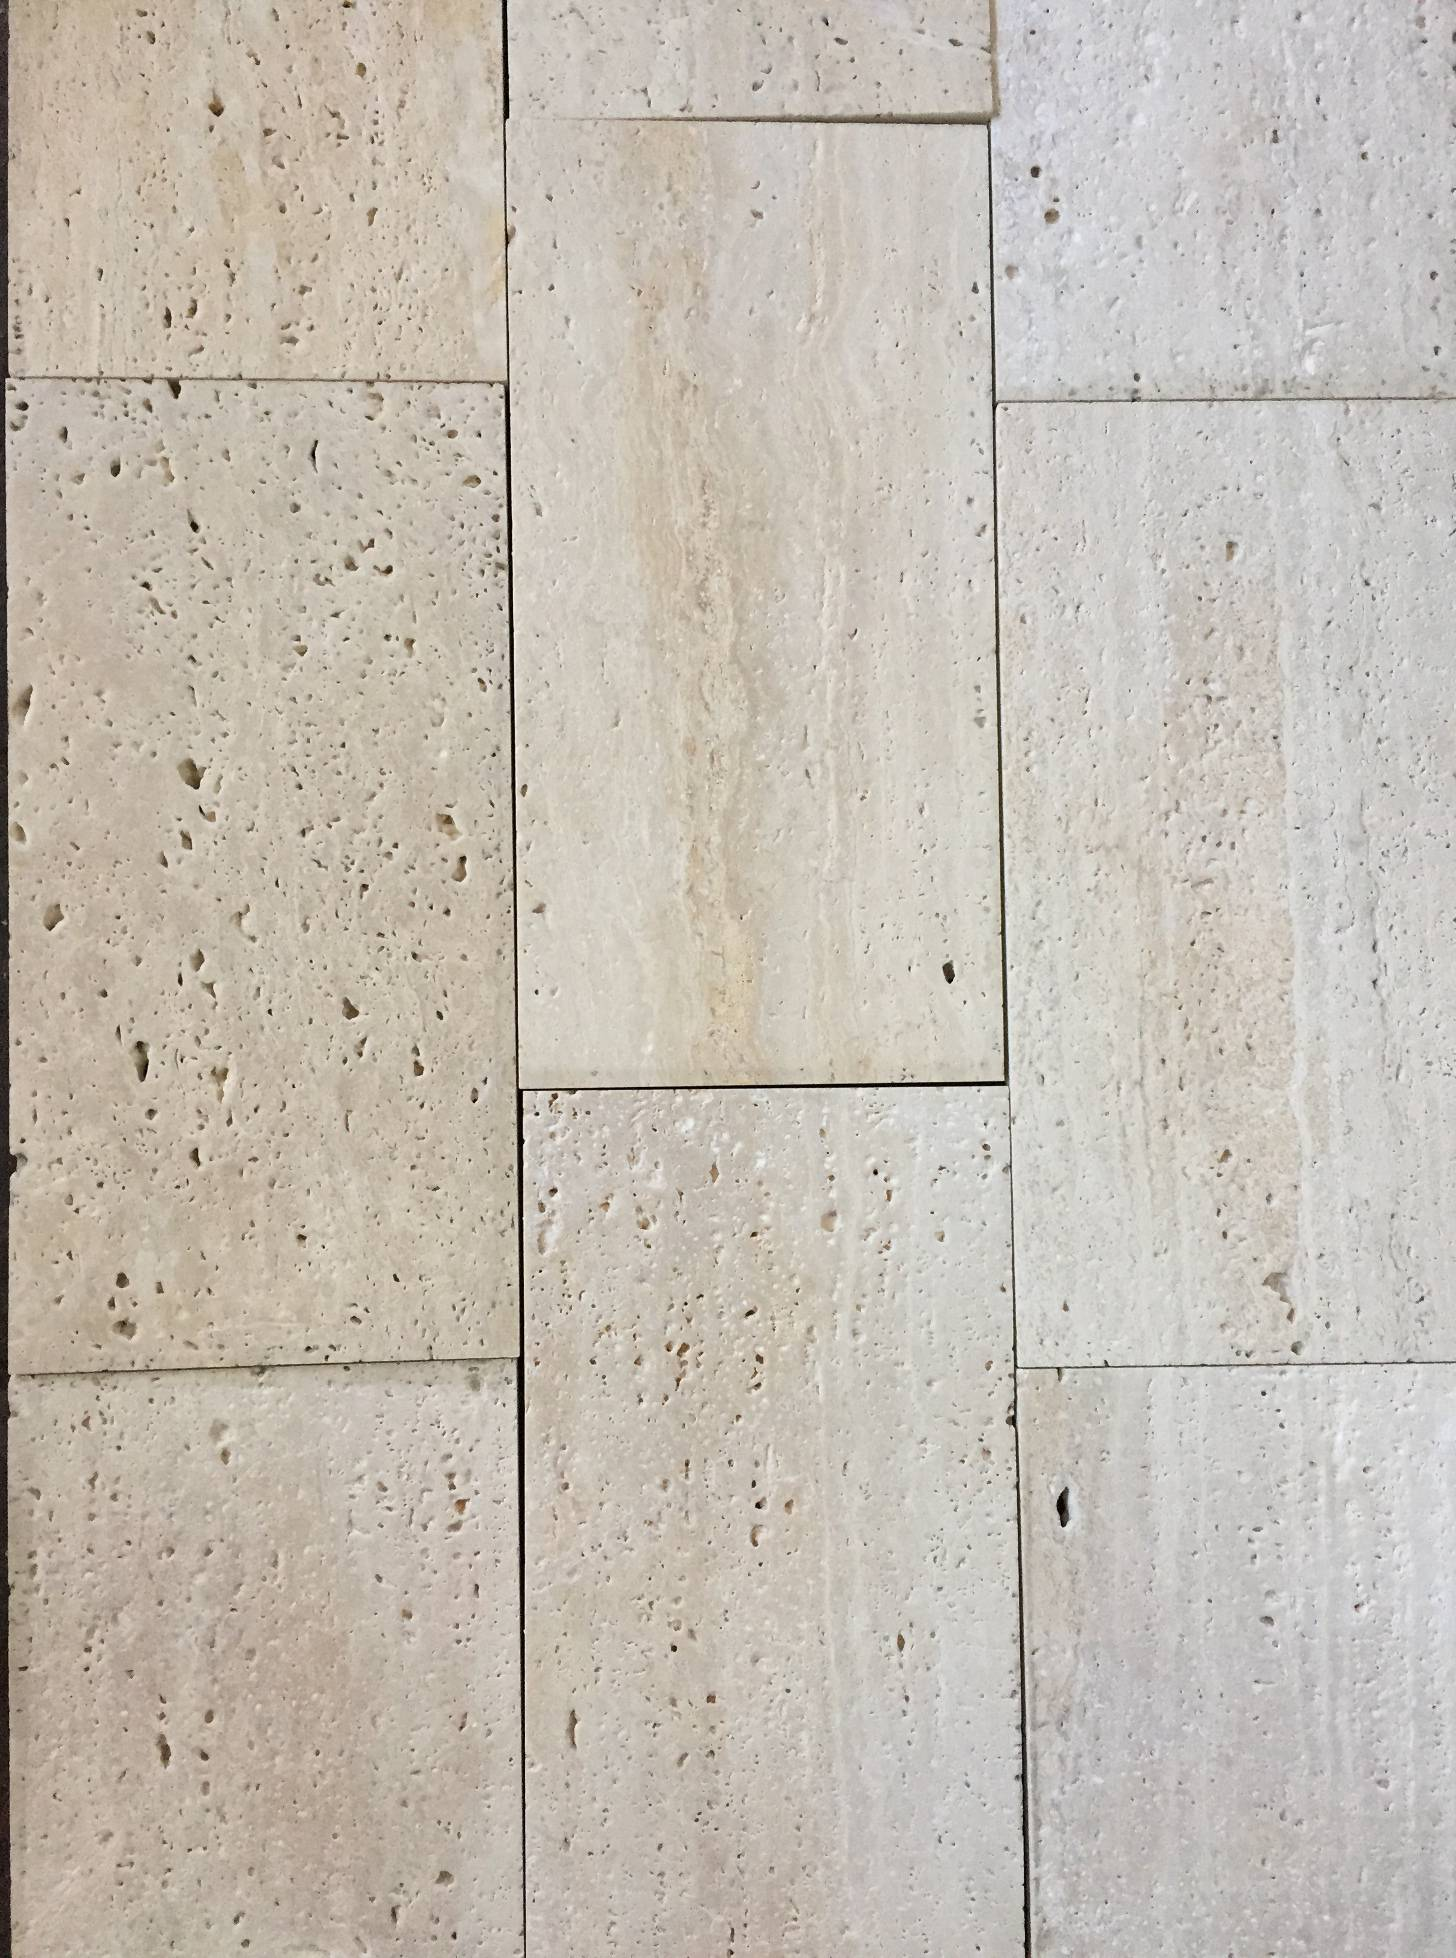 20,3x40,6 Travertine Light Vein-cut незаполненный фото 1 — изелия и проекты от Bevers Marmyr